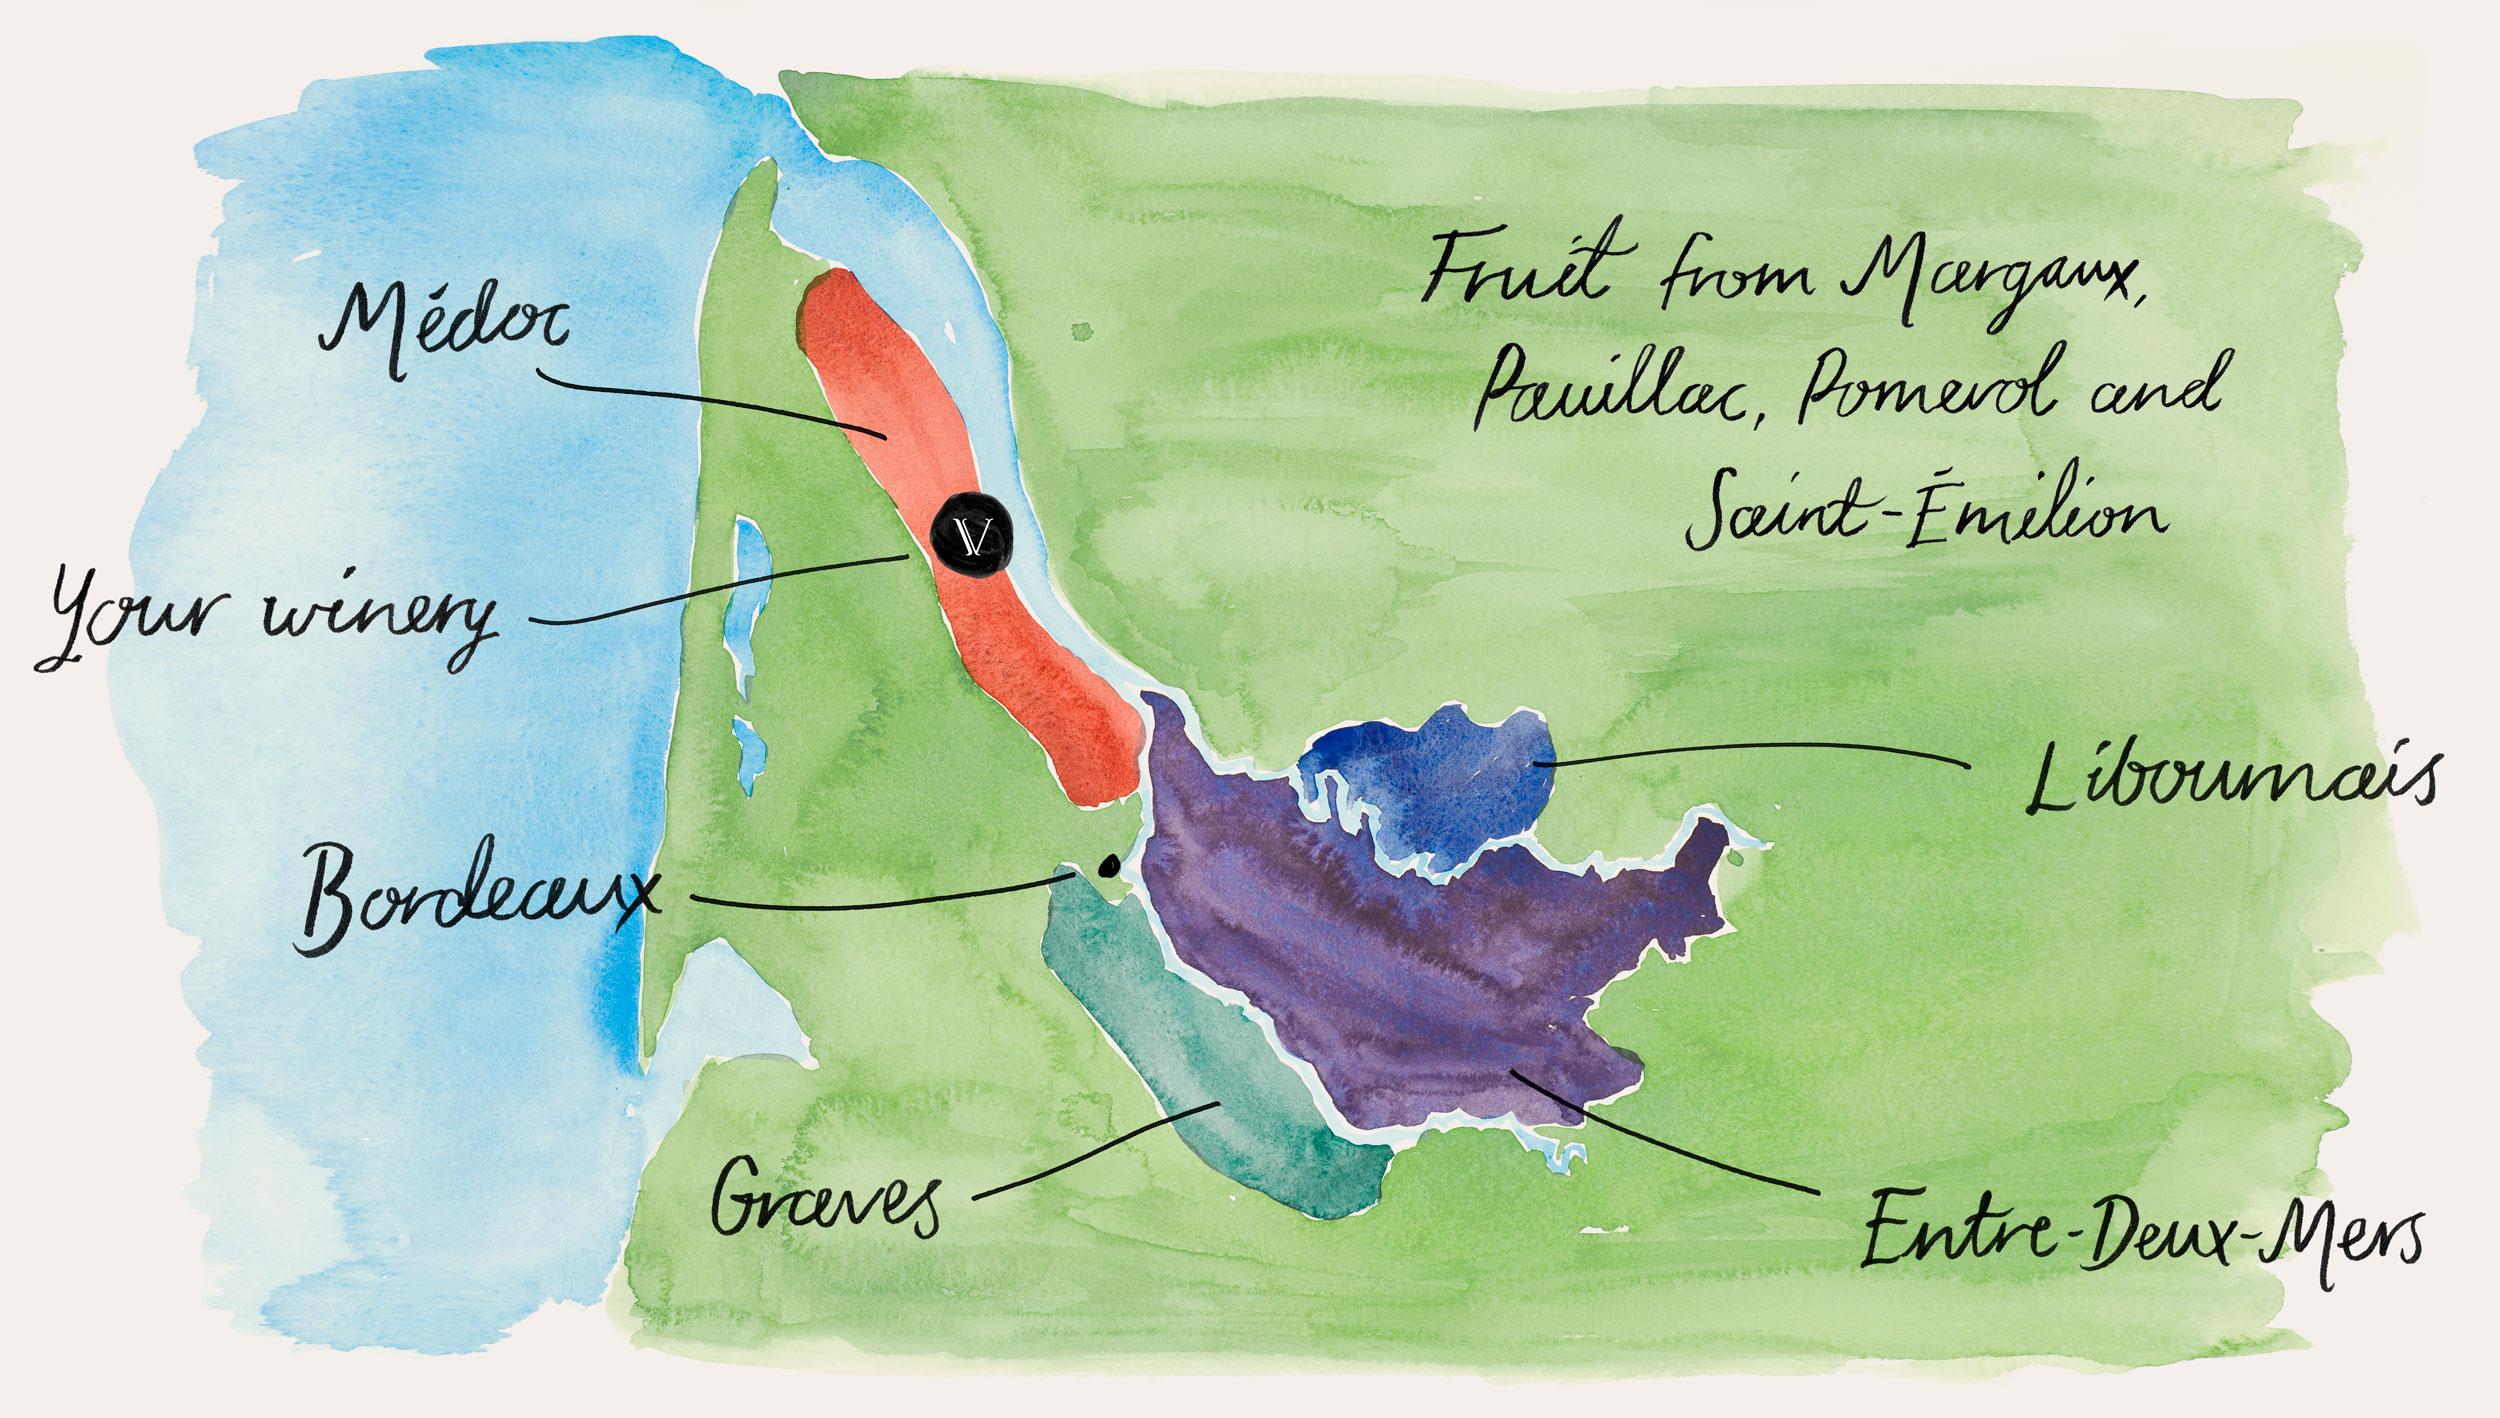 Explore Bordeaux wine region with VINIV